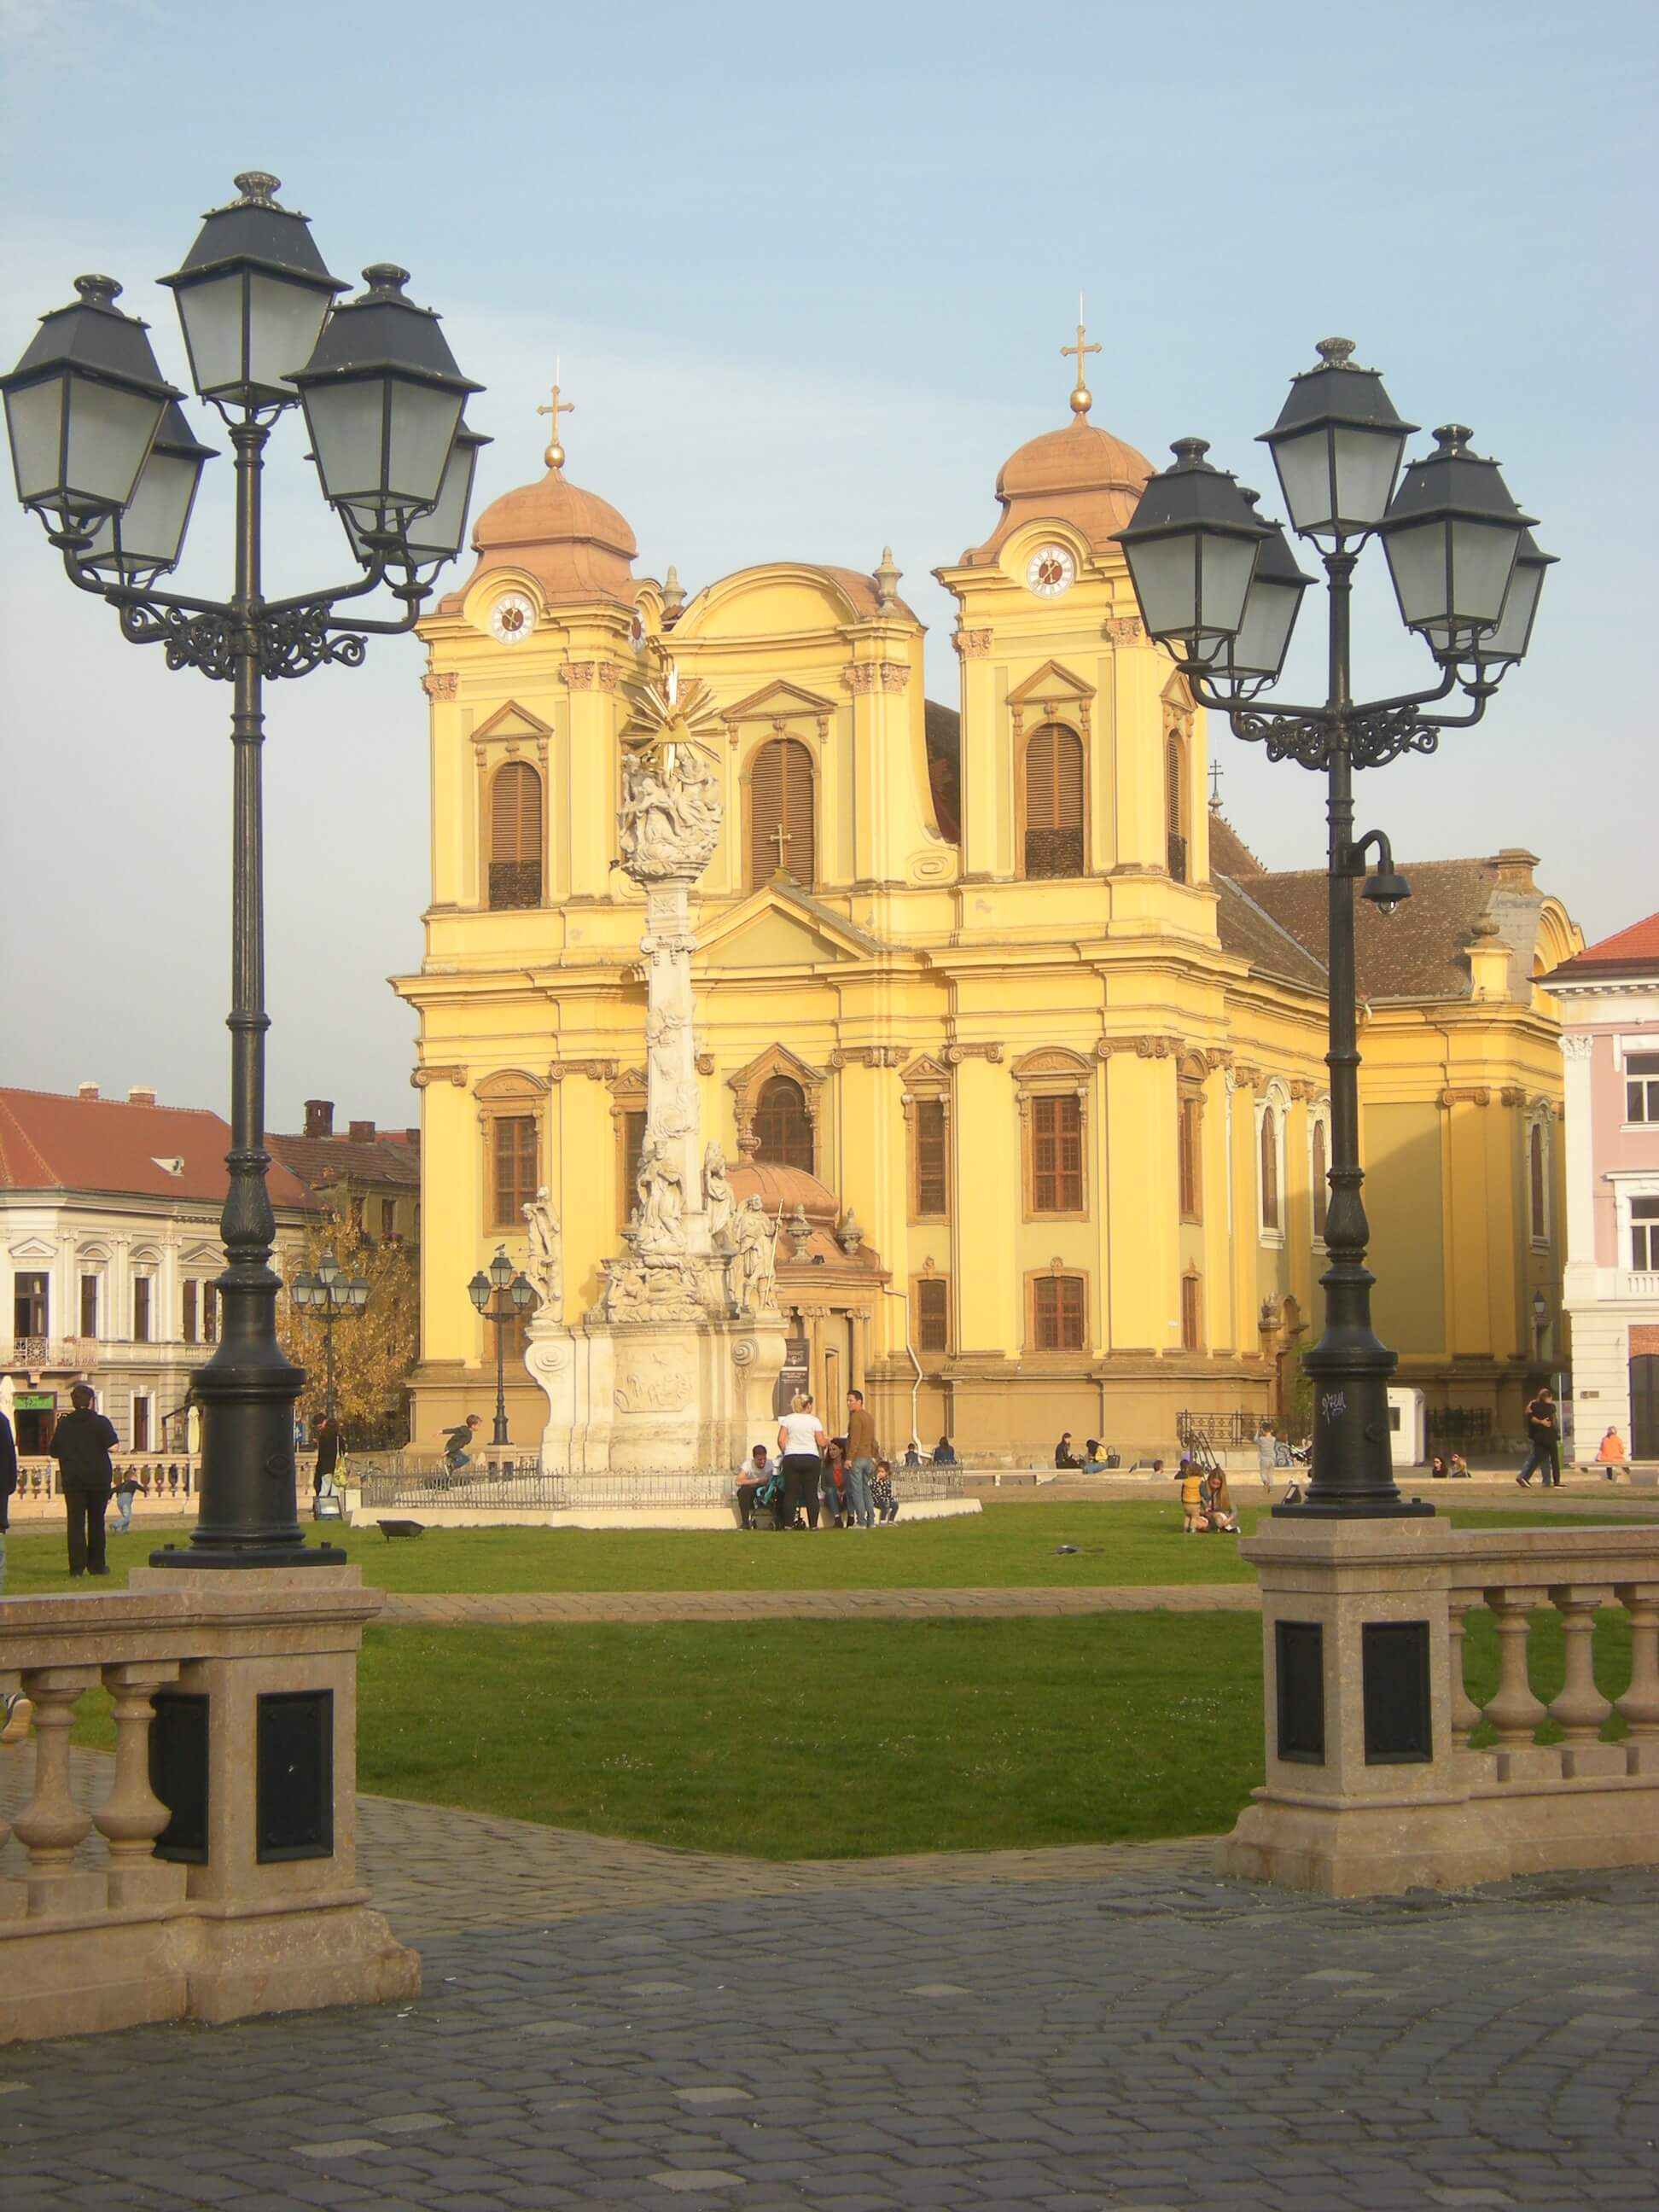 Rimokatolicka katedrala, Temisvar